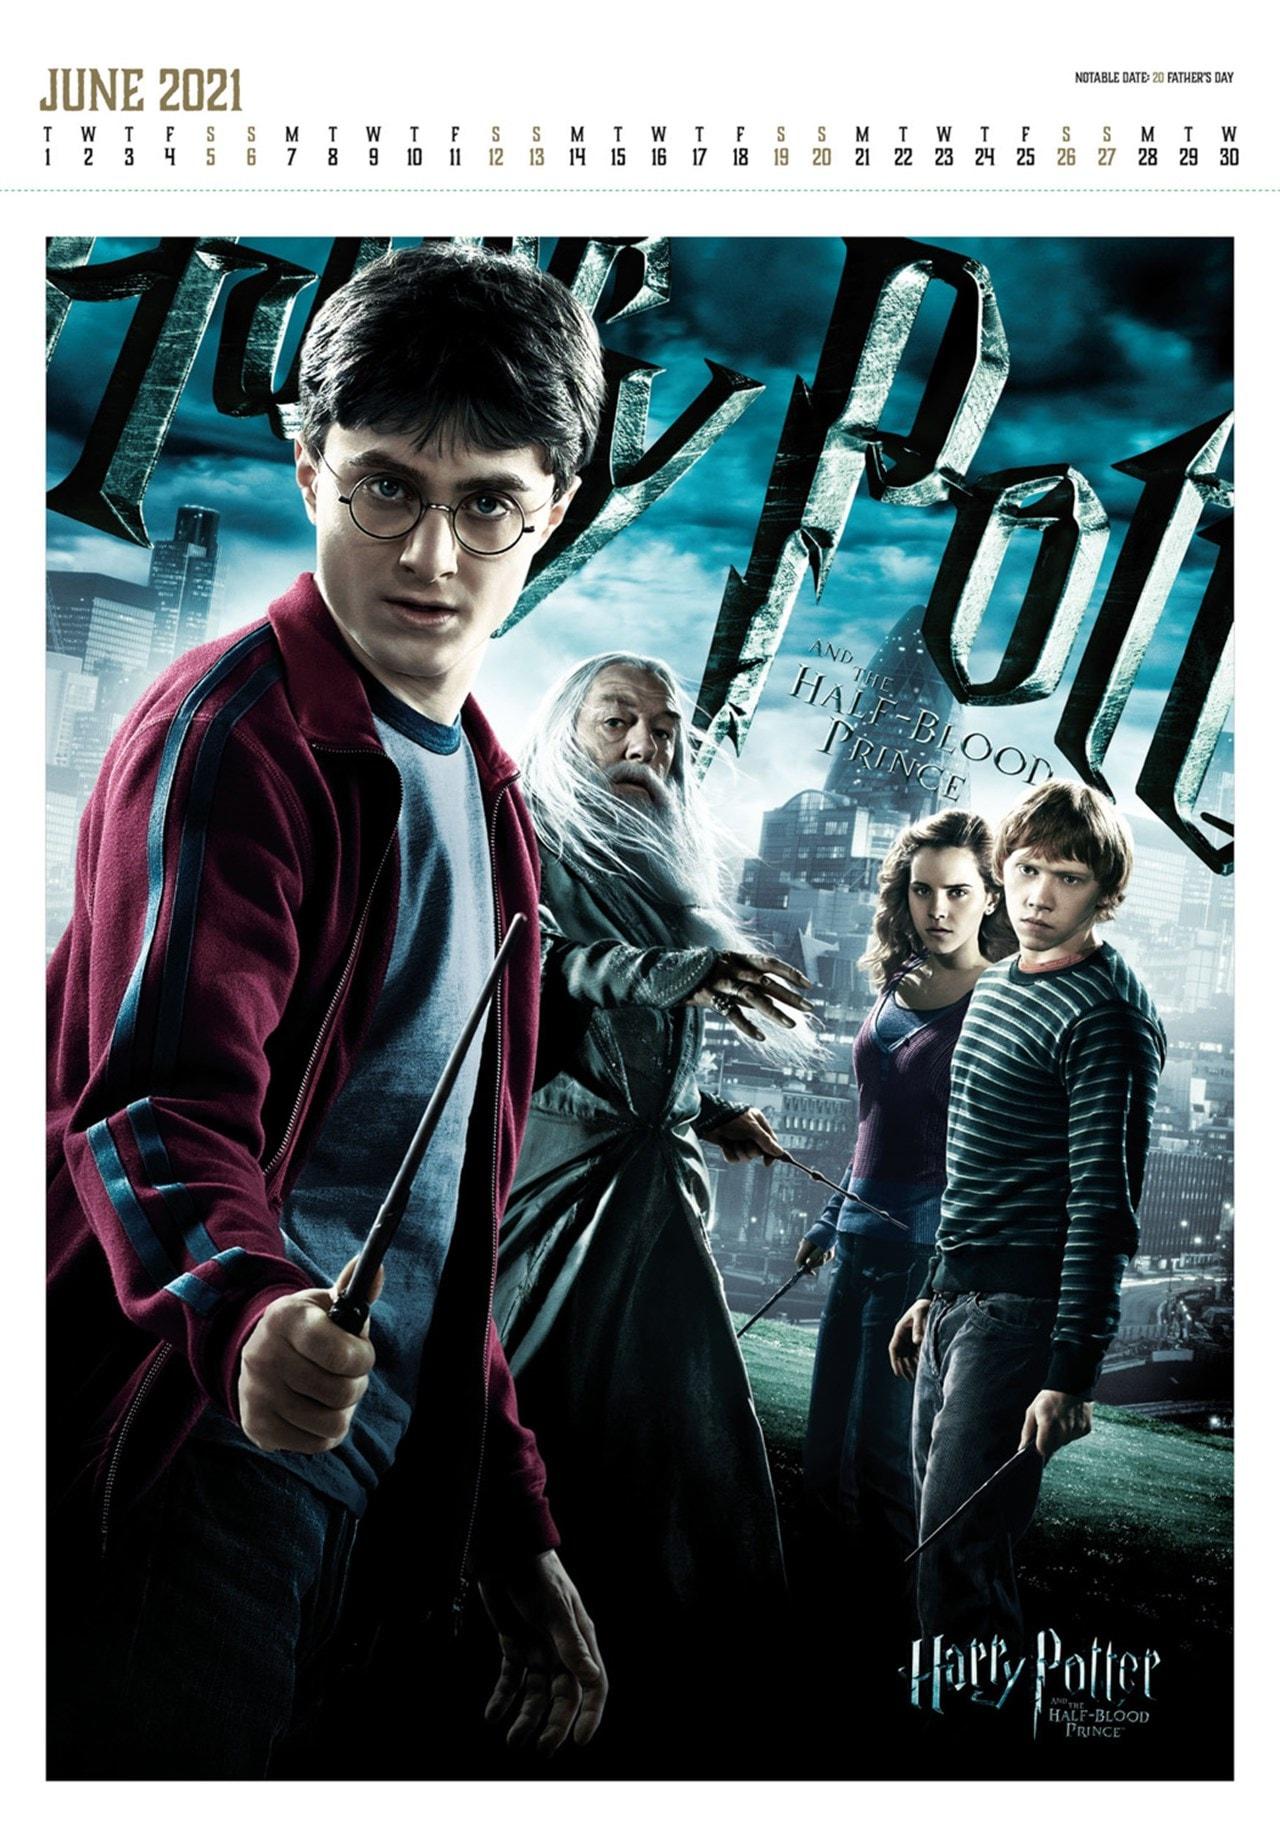 Harry Potter: A3 Deluxe 2021 Calendar - 2